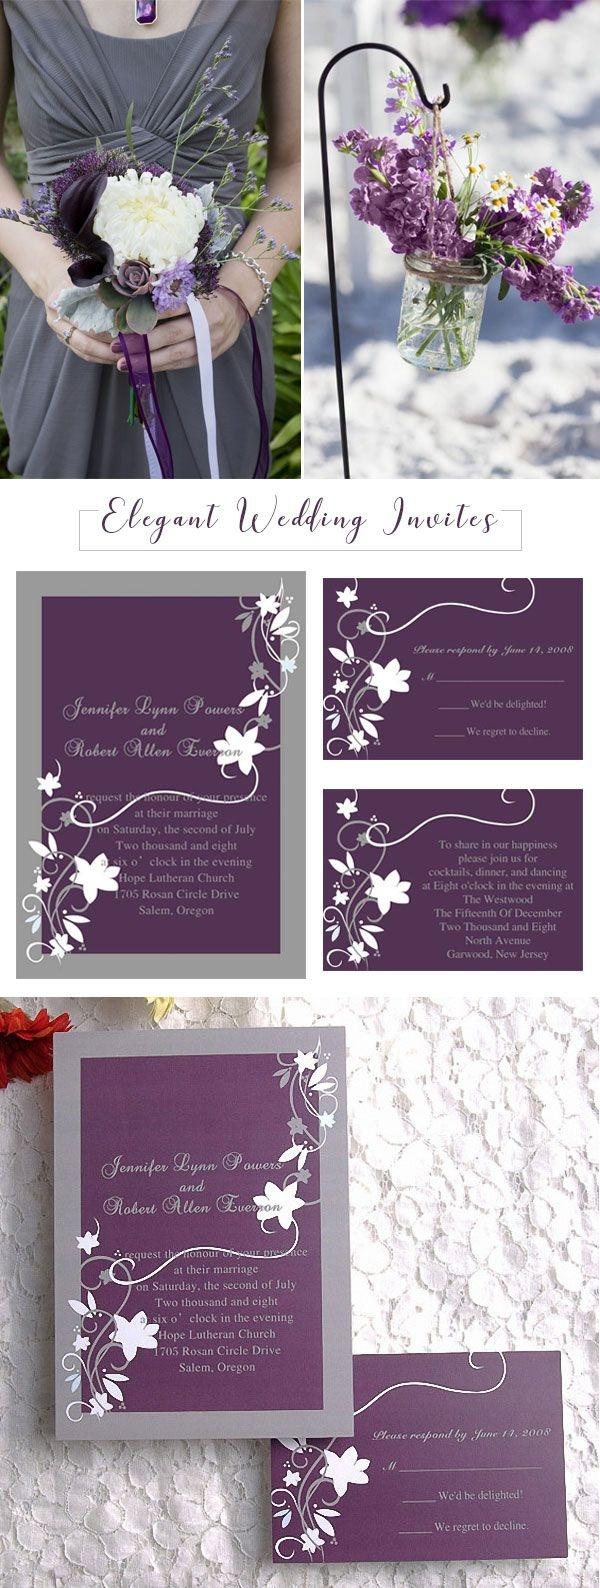 Purple And Silver Wedding Invitations Fresh Cheap Purple And Silver Wedding Invitations Collection